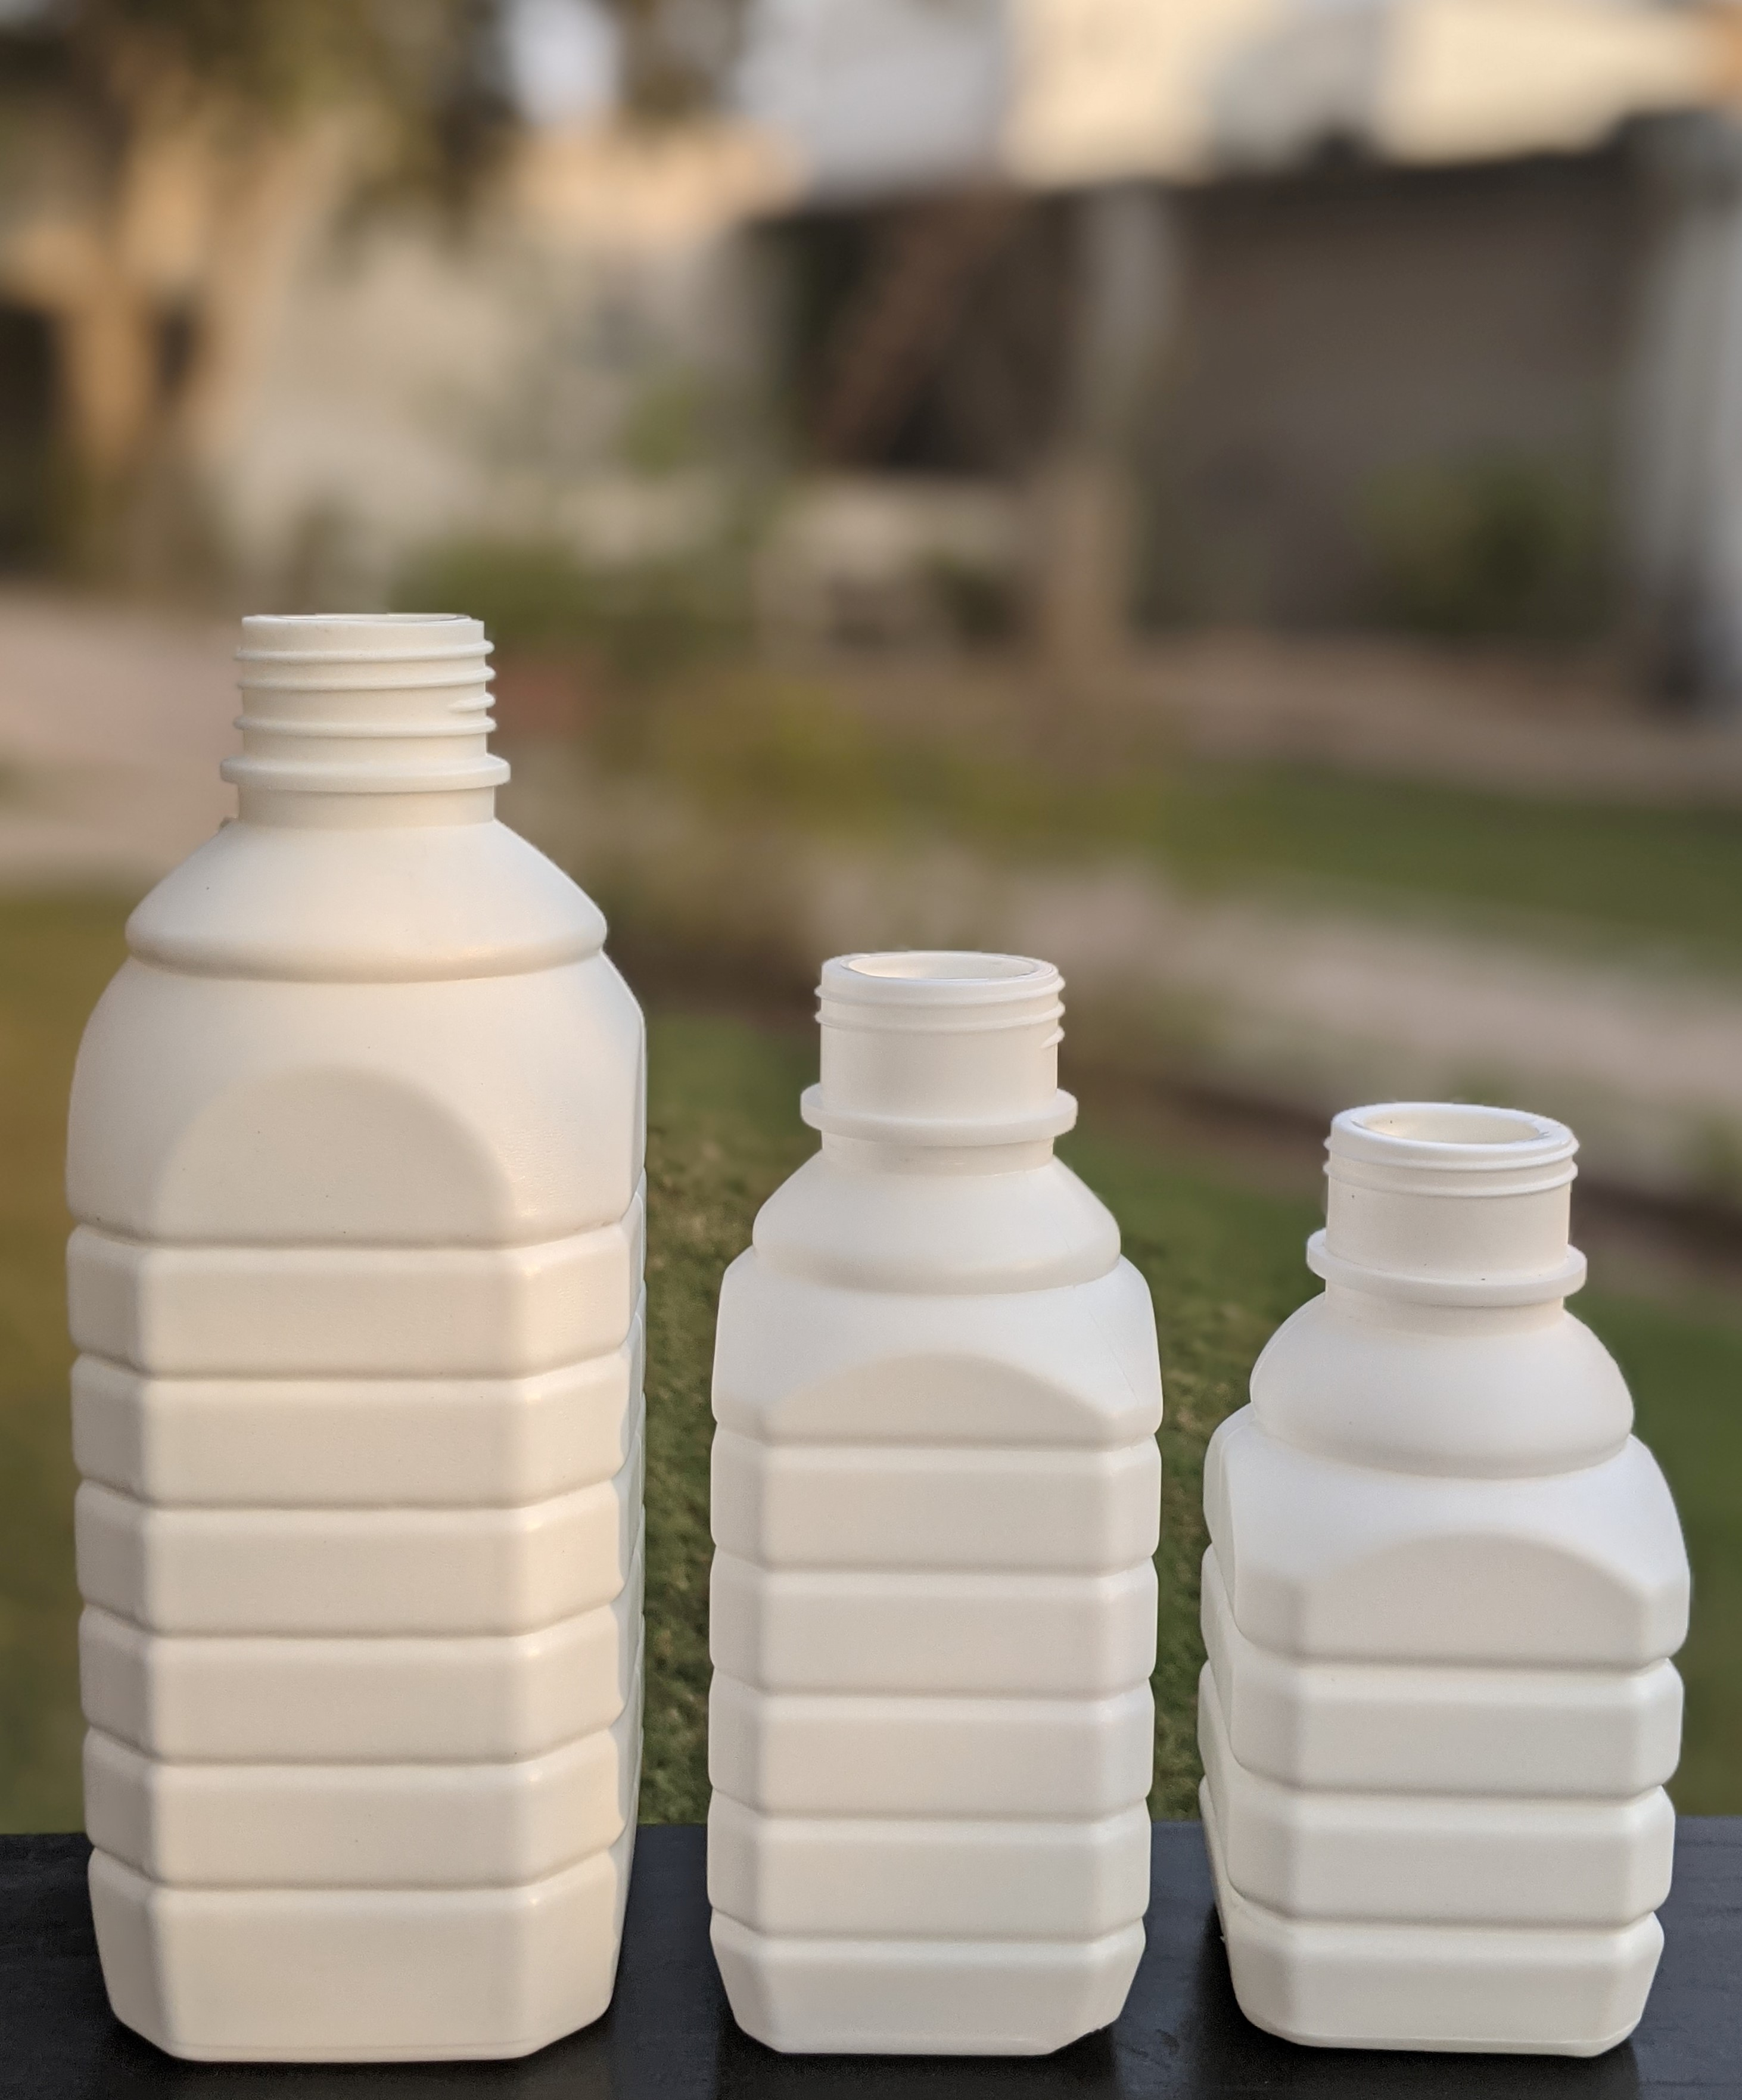 square shaped bottle